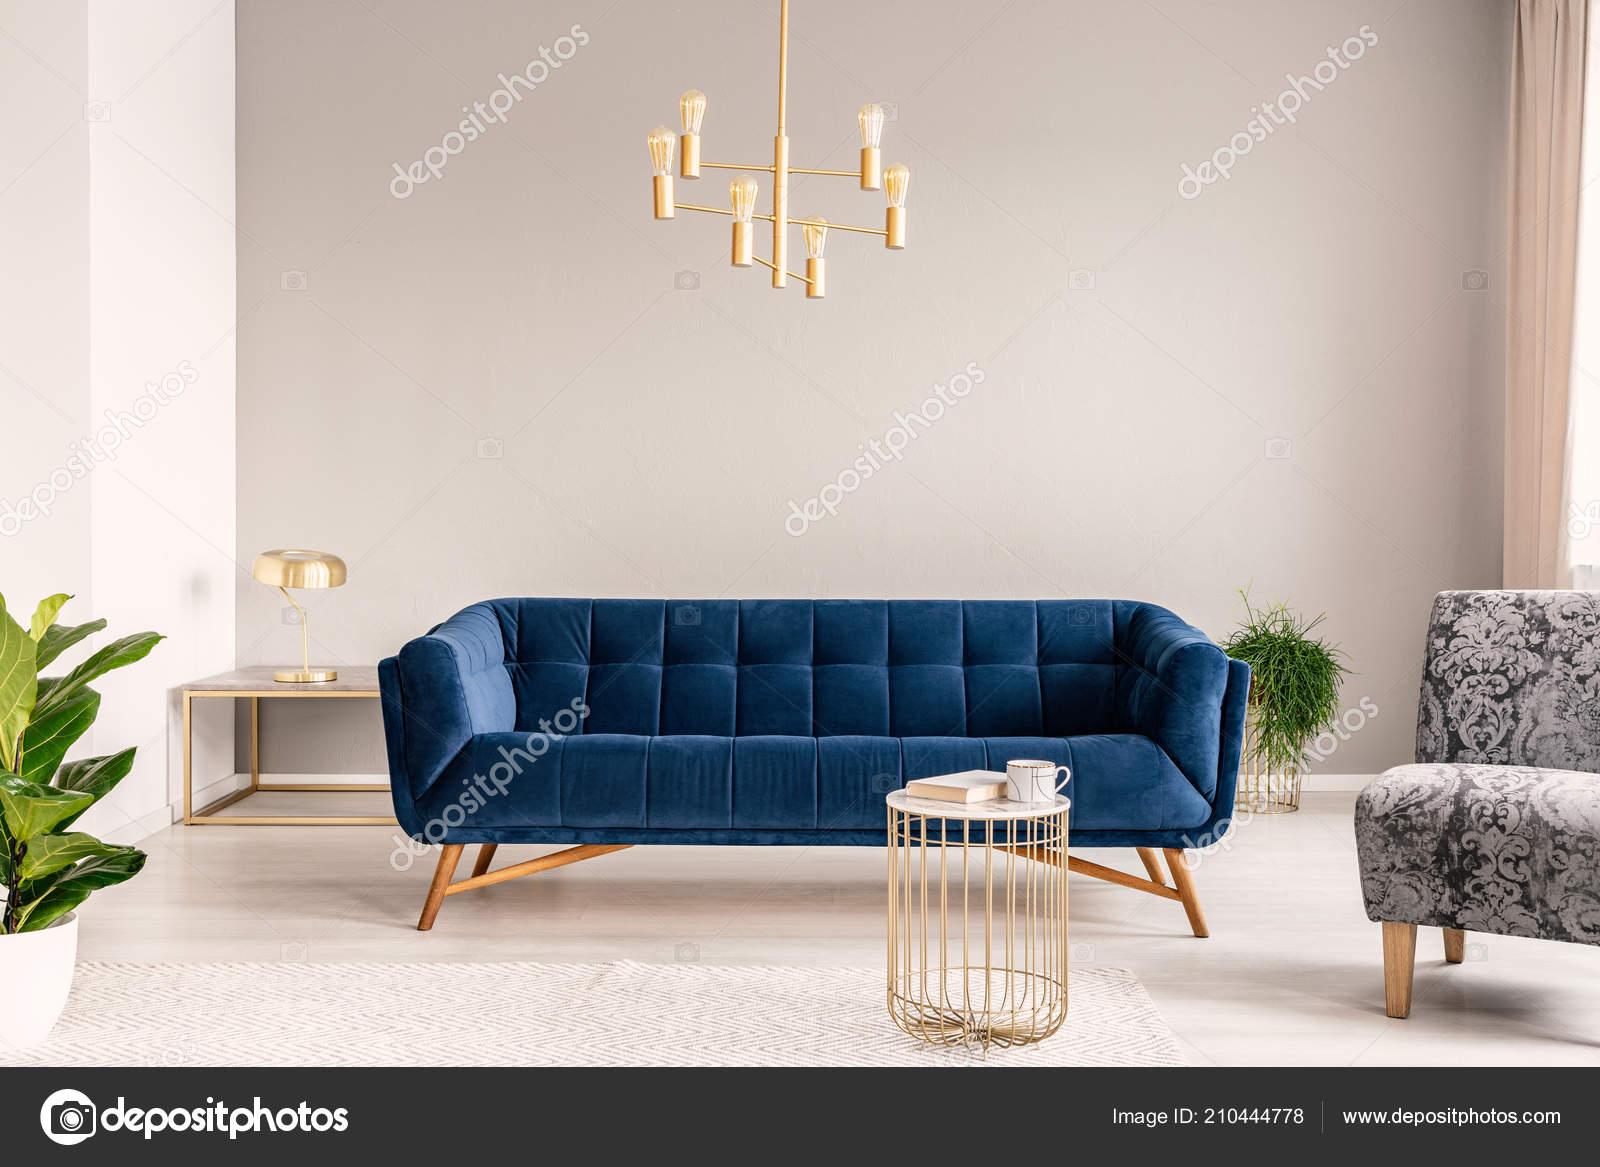 Gold Lamp Hanging Royal Blue Sofa Real Photo Light Grey Stock Photo Image By Photographee Eu 210444778